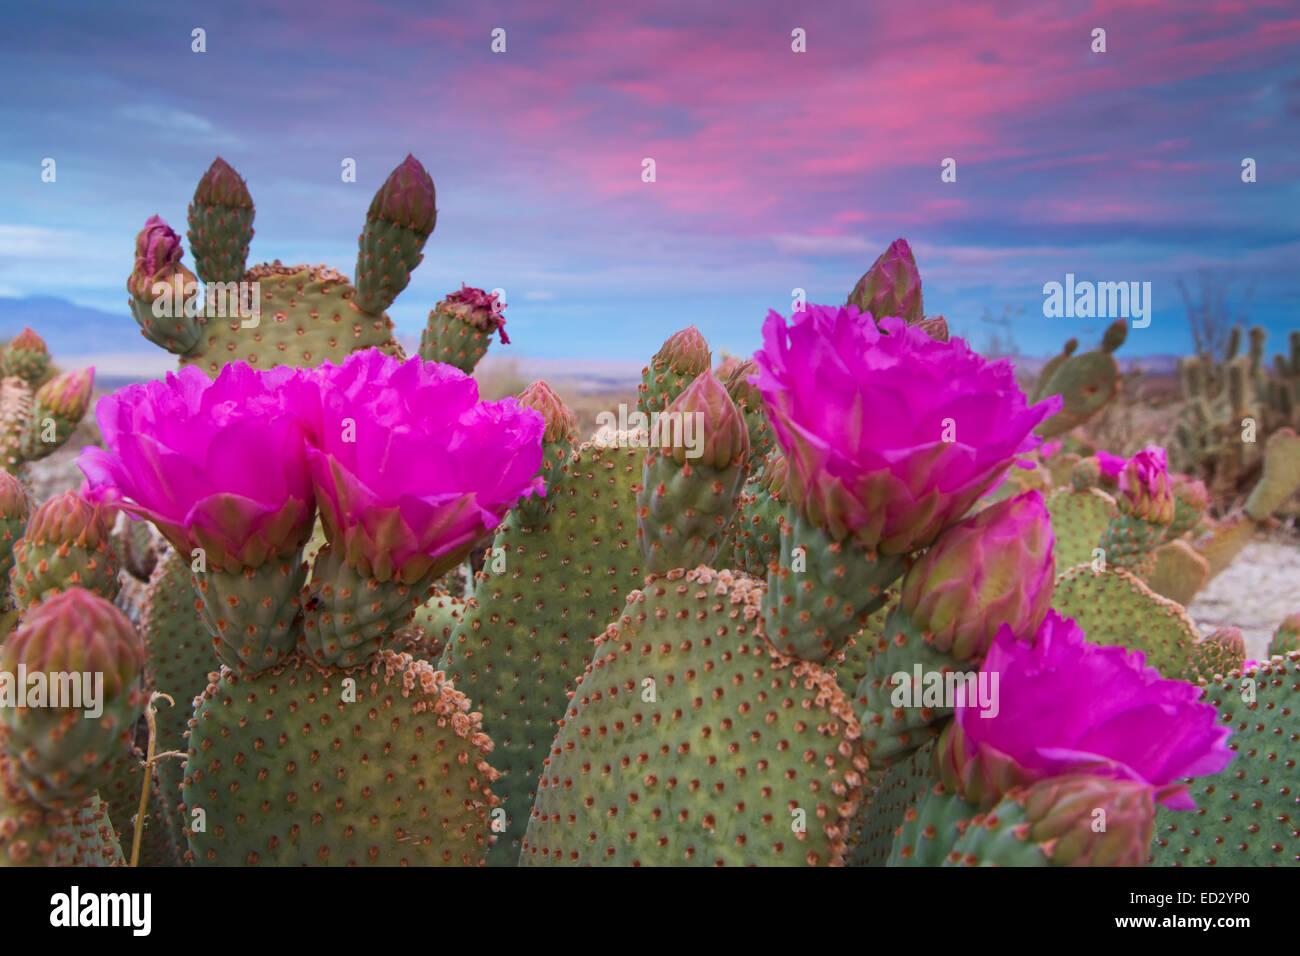 Cactus en fleur de castor, Anza-Borrego Desert State Park, Californie. Photo Stock